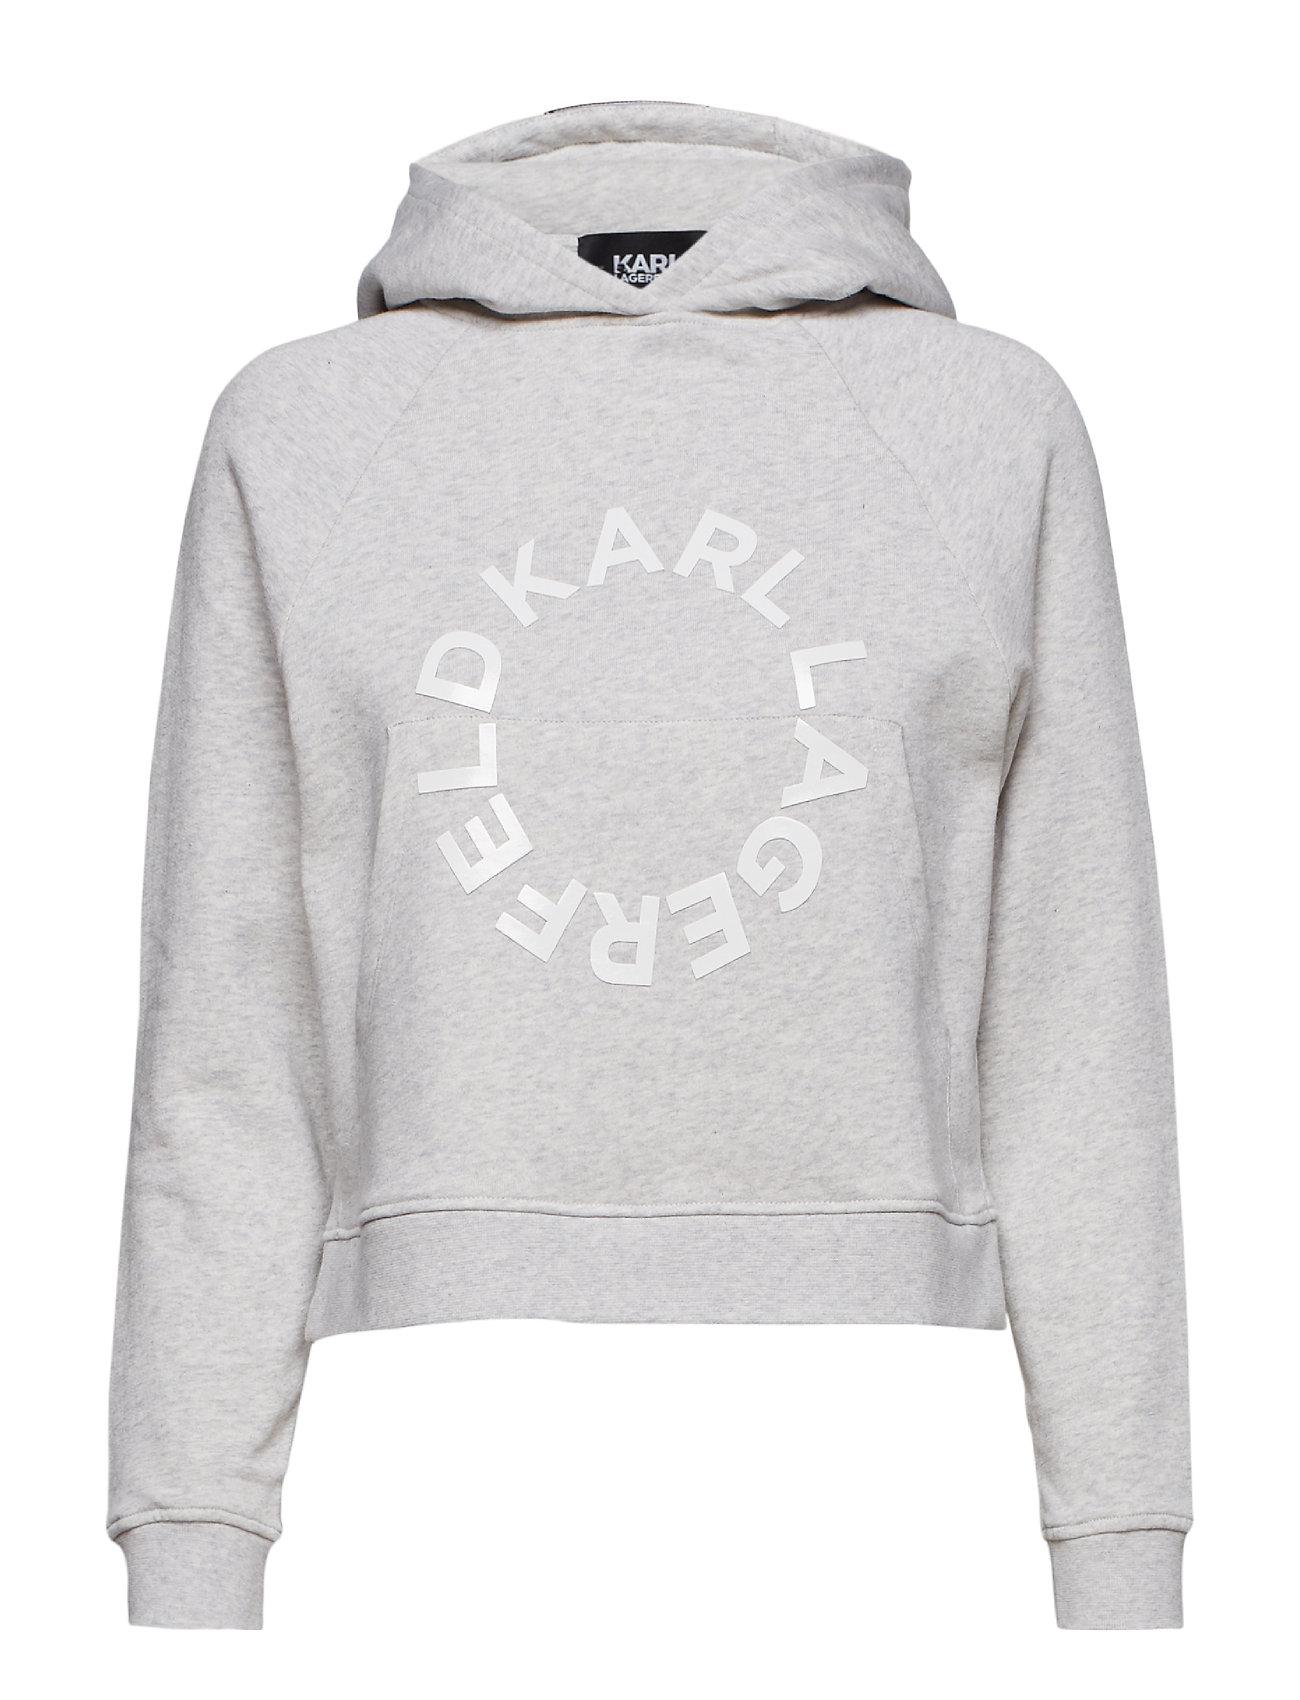 Karl Lagerfeld Cropped Hoodie W/ Circle Logo